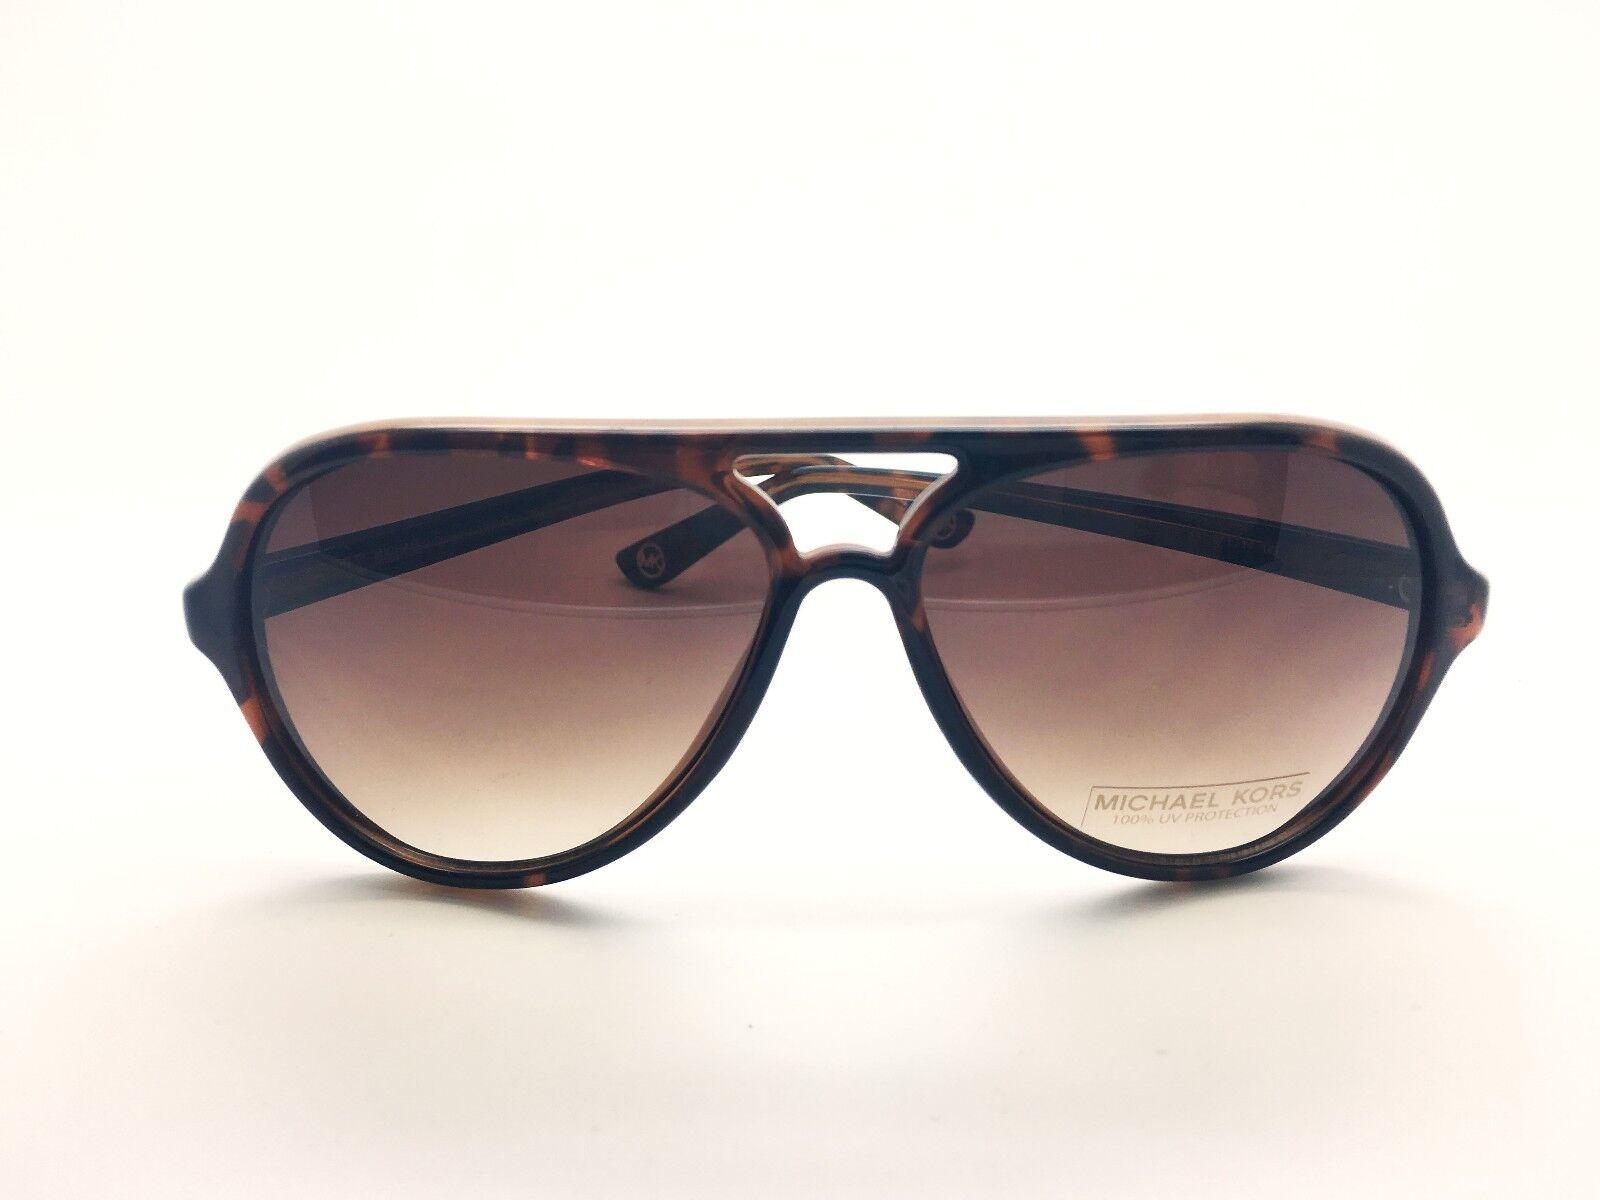 faa52b7e5b Michael Kors Sunglasses Women M2811S NEW Black Designer Authentic MK ...